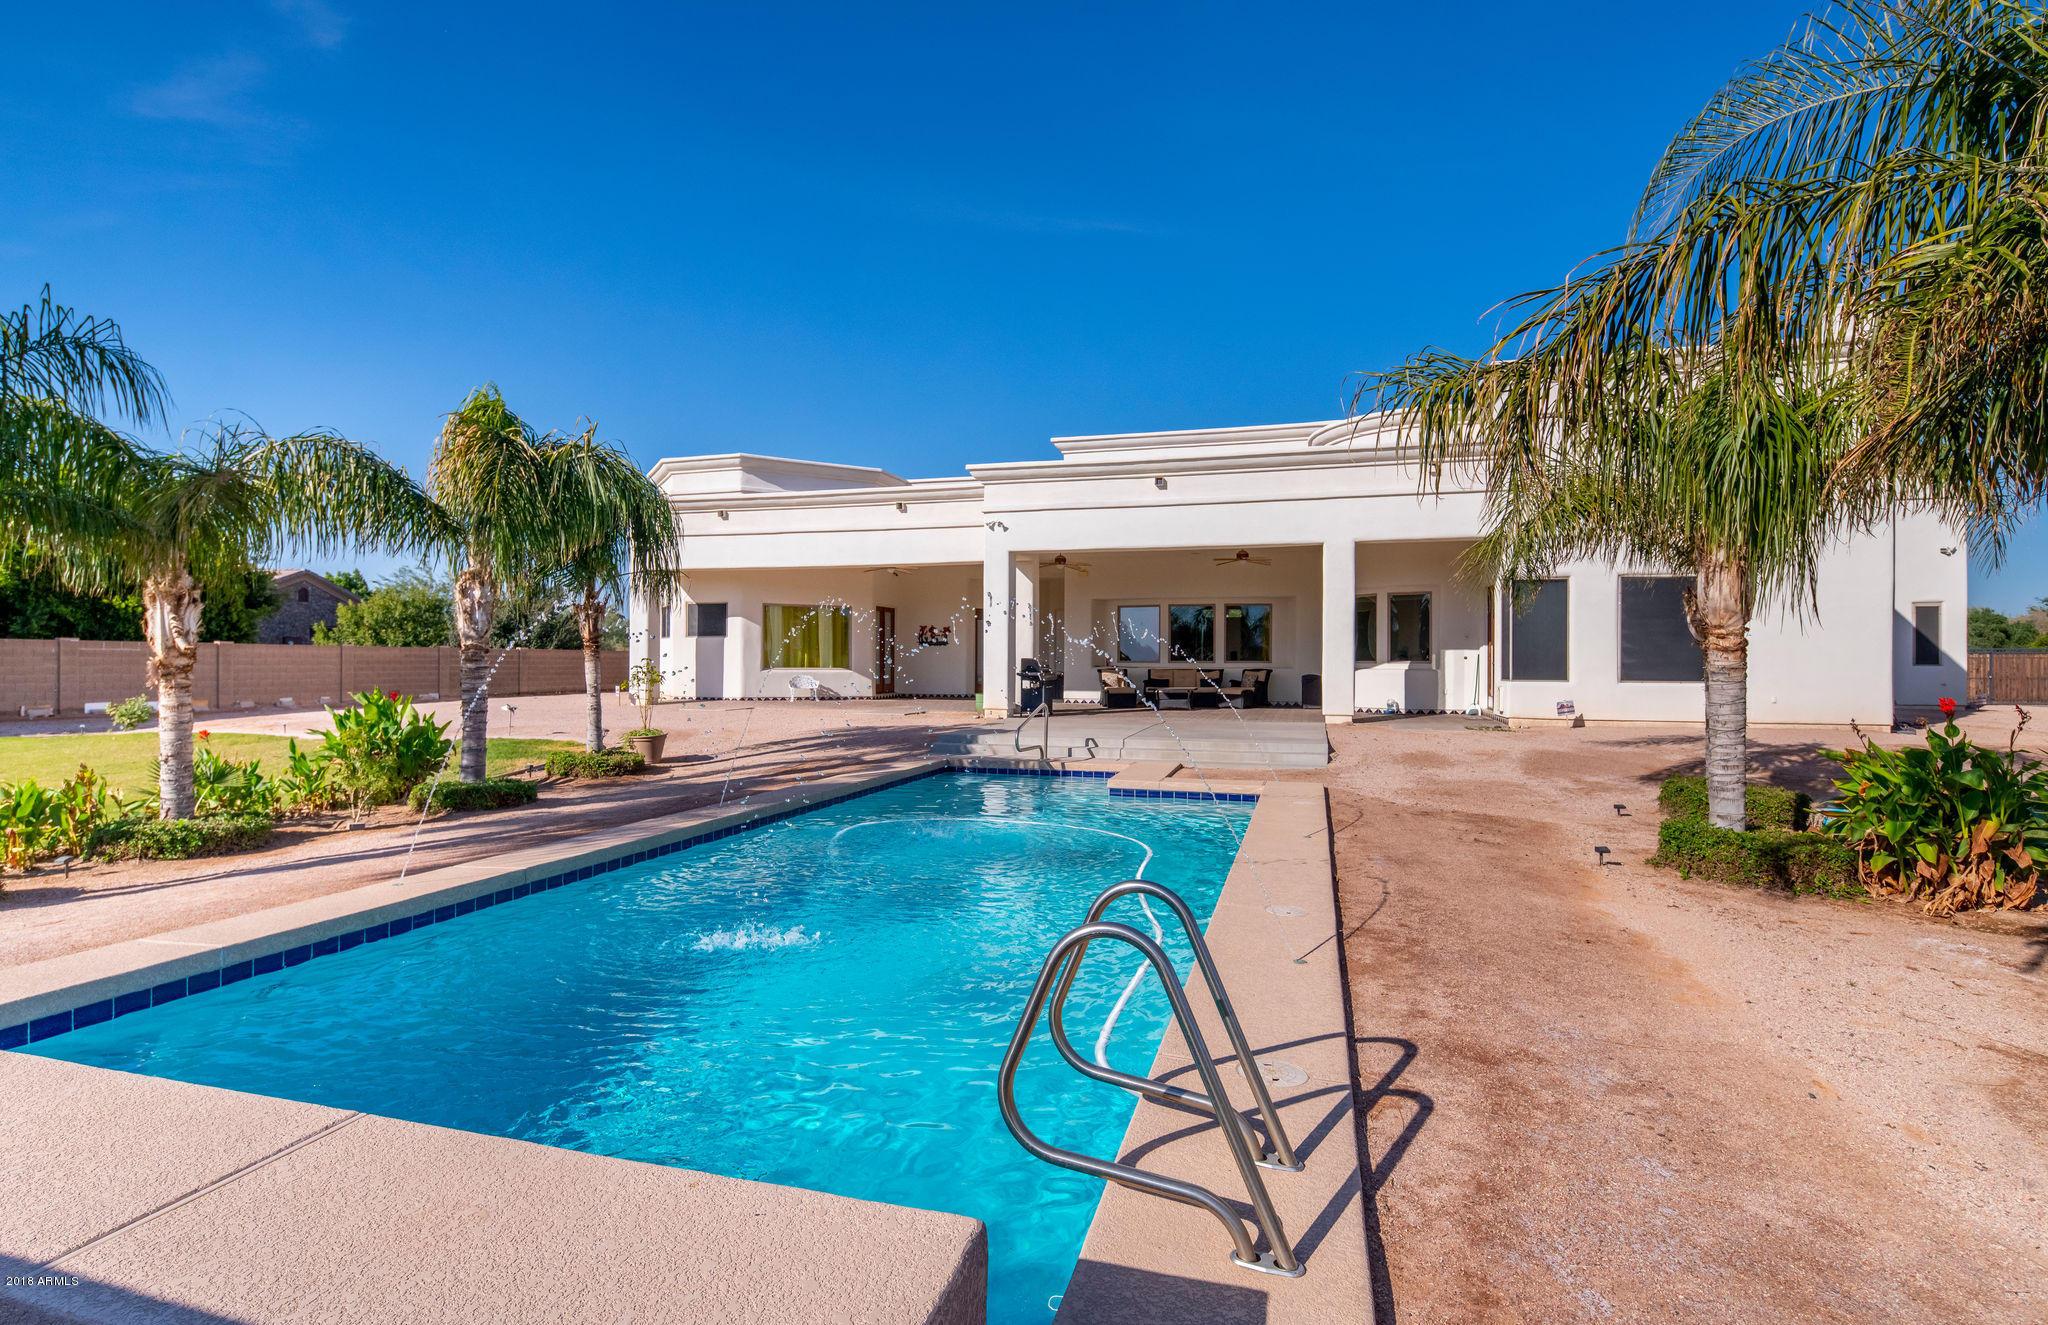 MLS 5825413 16595 W YUMA Road, Goodyear, AZ 85338 Goodyear AZ Private Pool